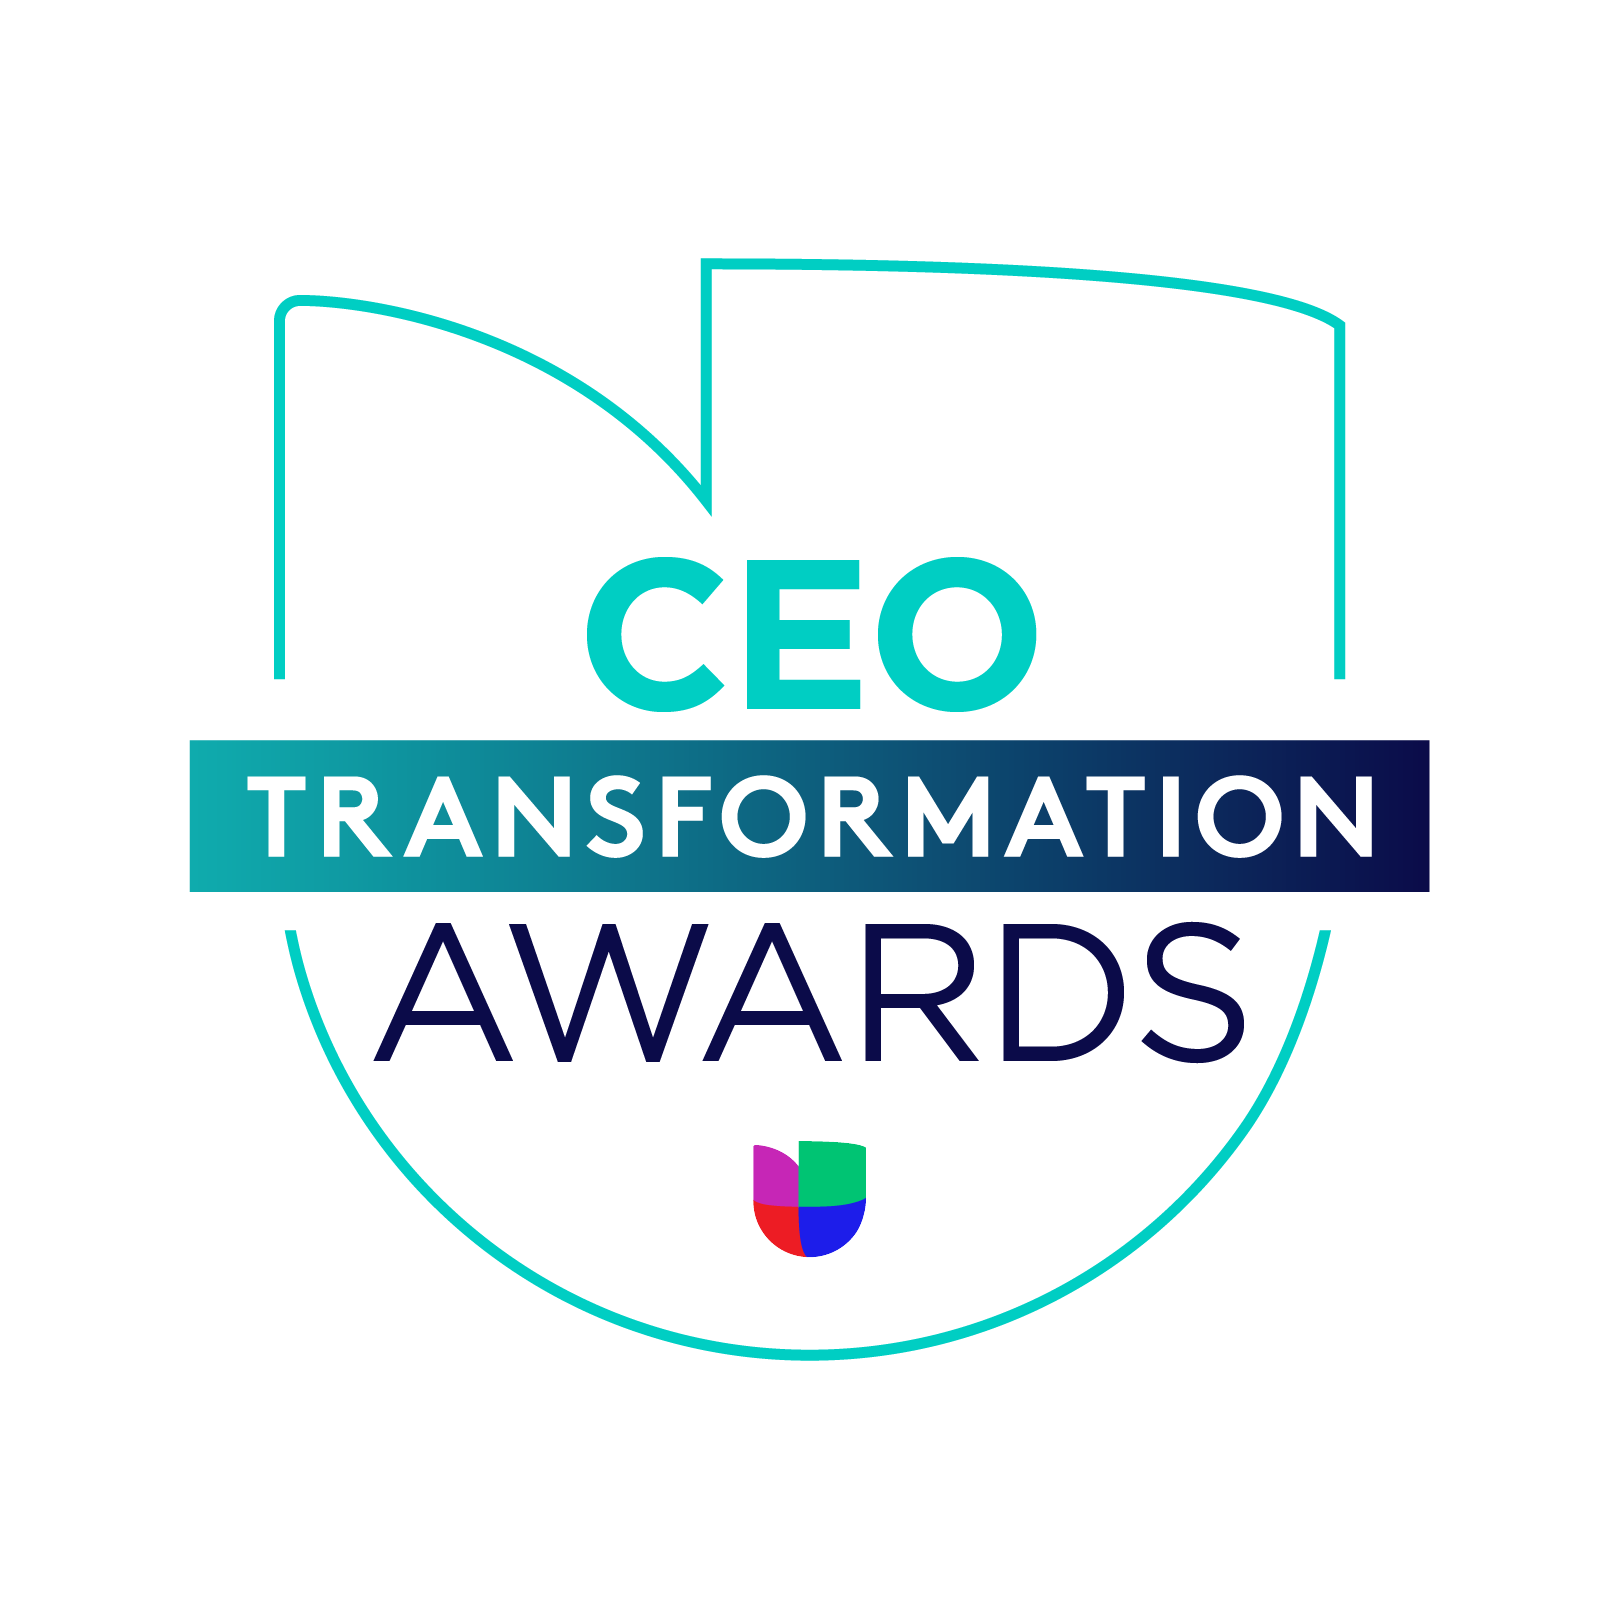 CEO Transformation Awards